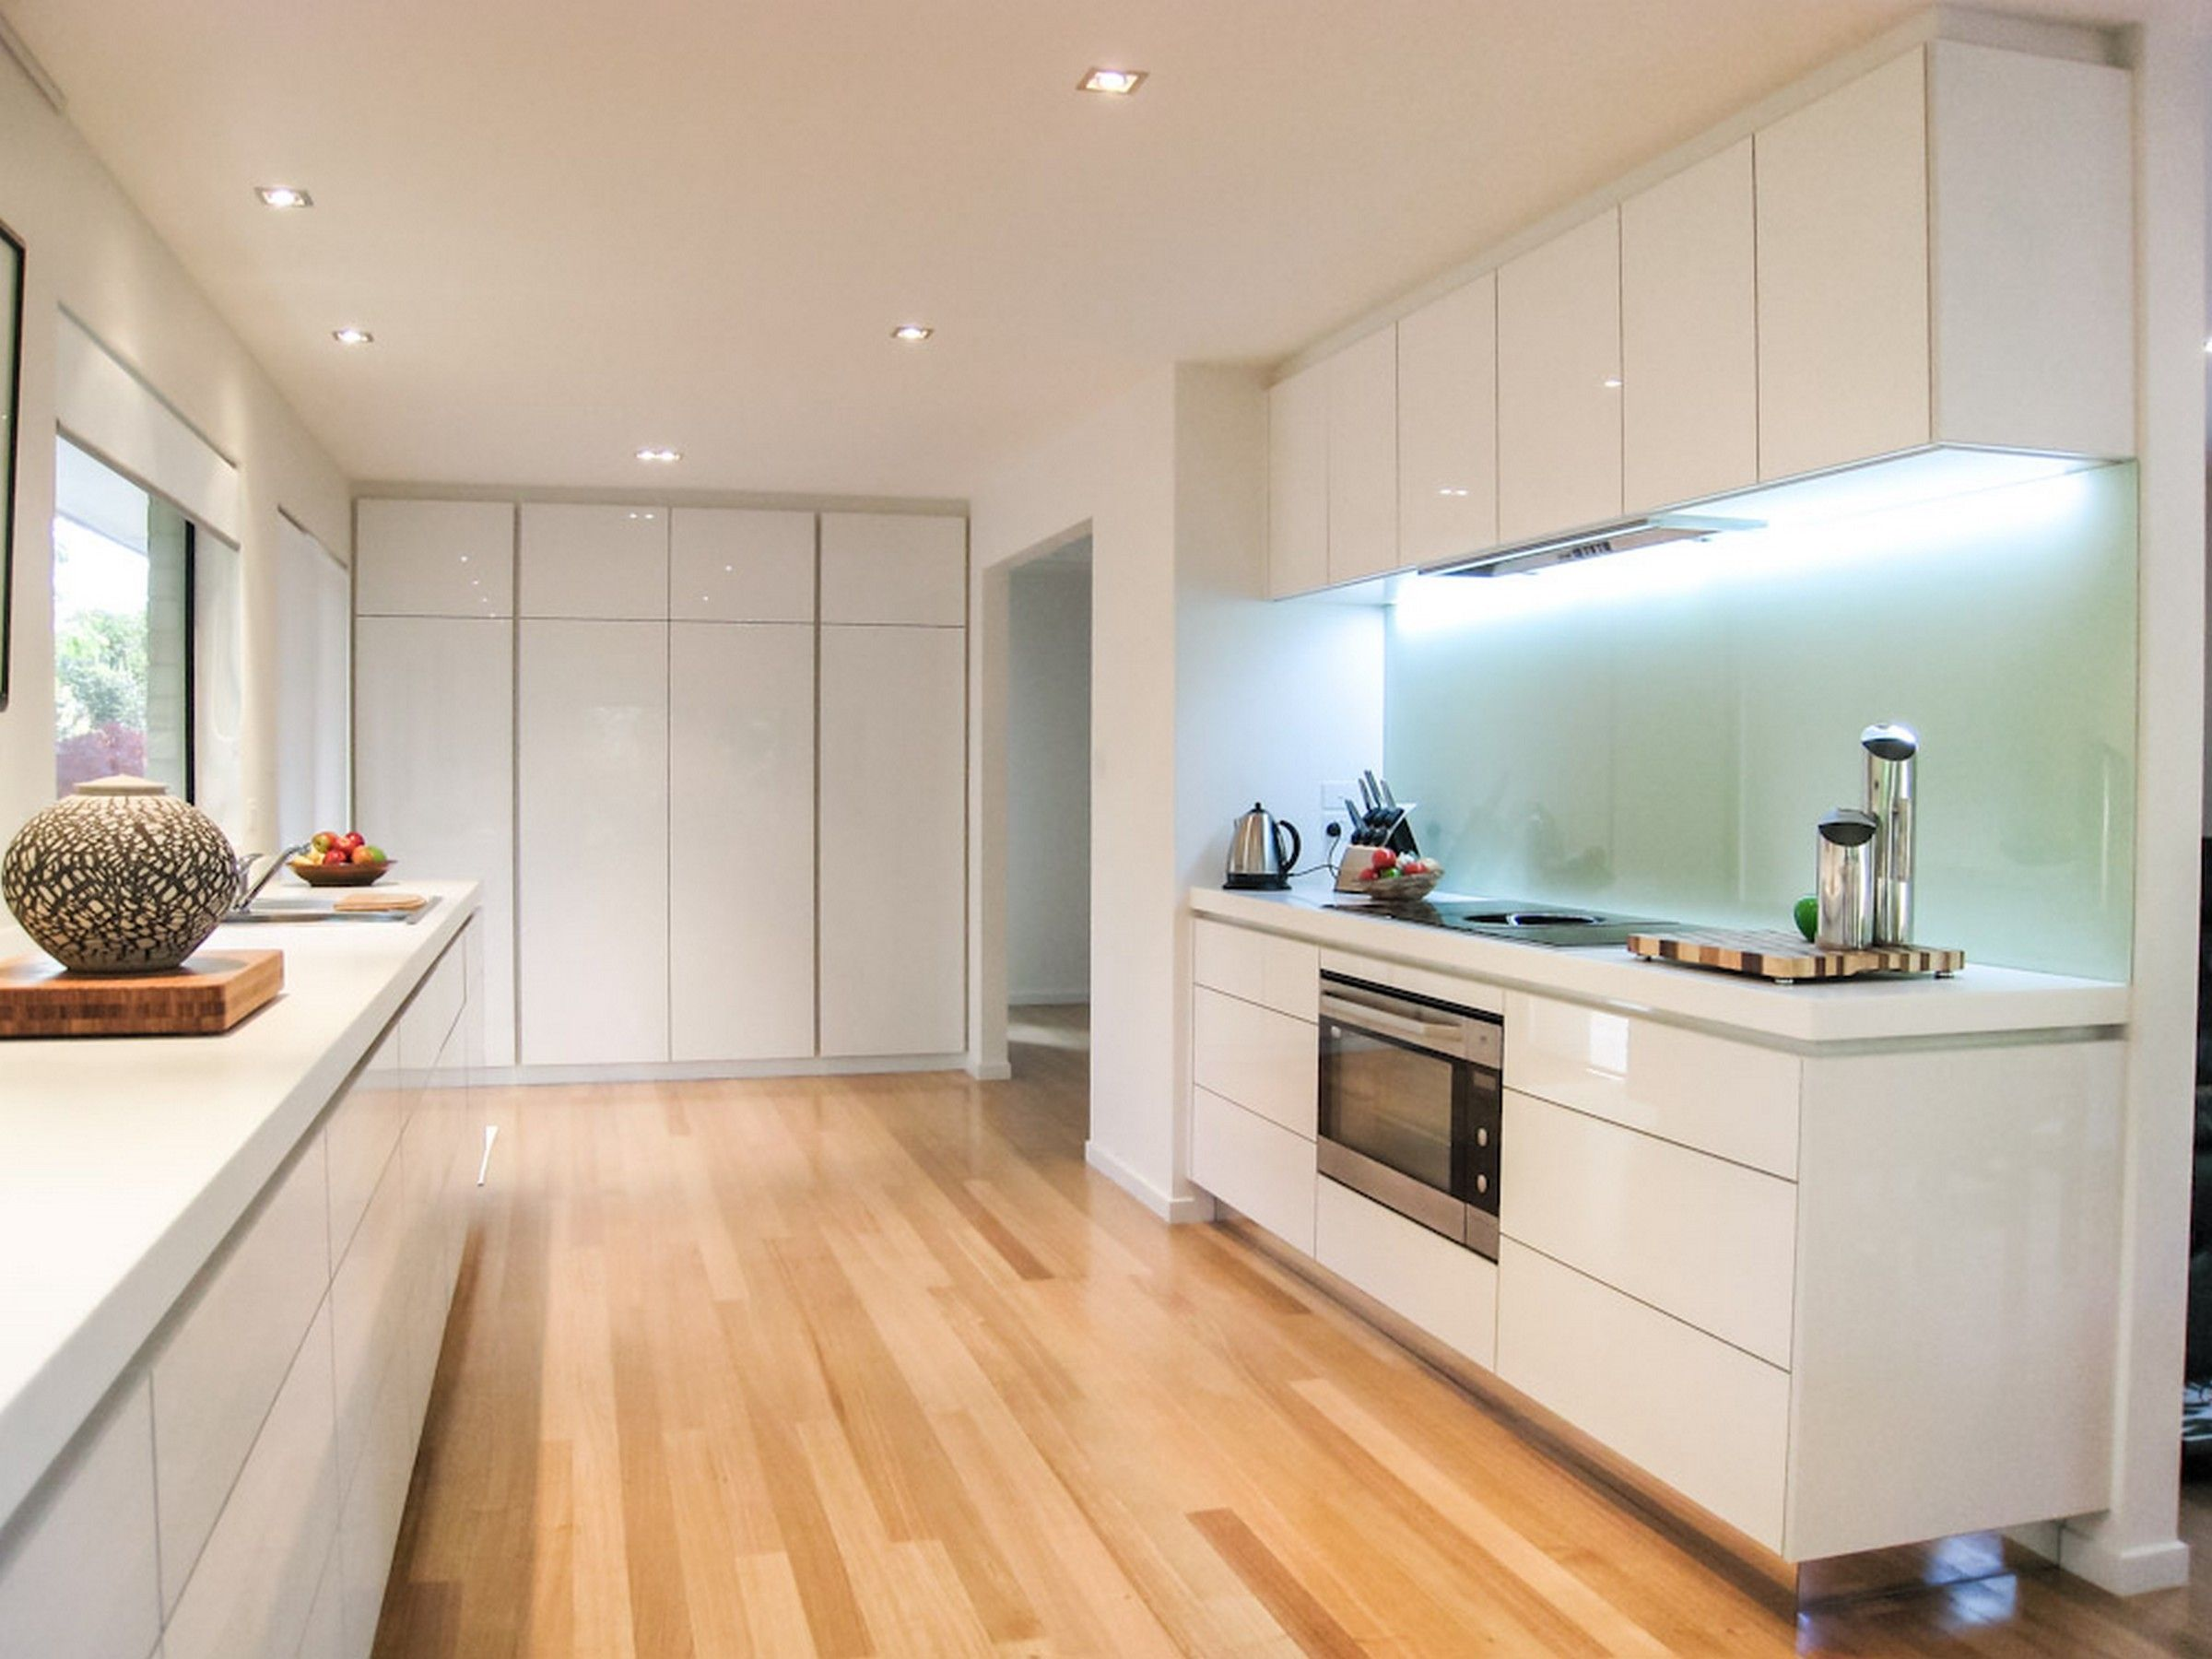 Modern Kitchen Cabinets No Handles Simple Kitchen Cabinets Kitchen Cabinets Without Handles Kitchen Handles